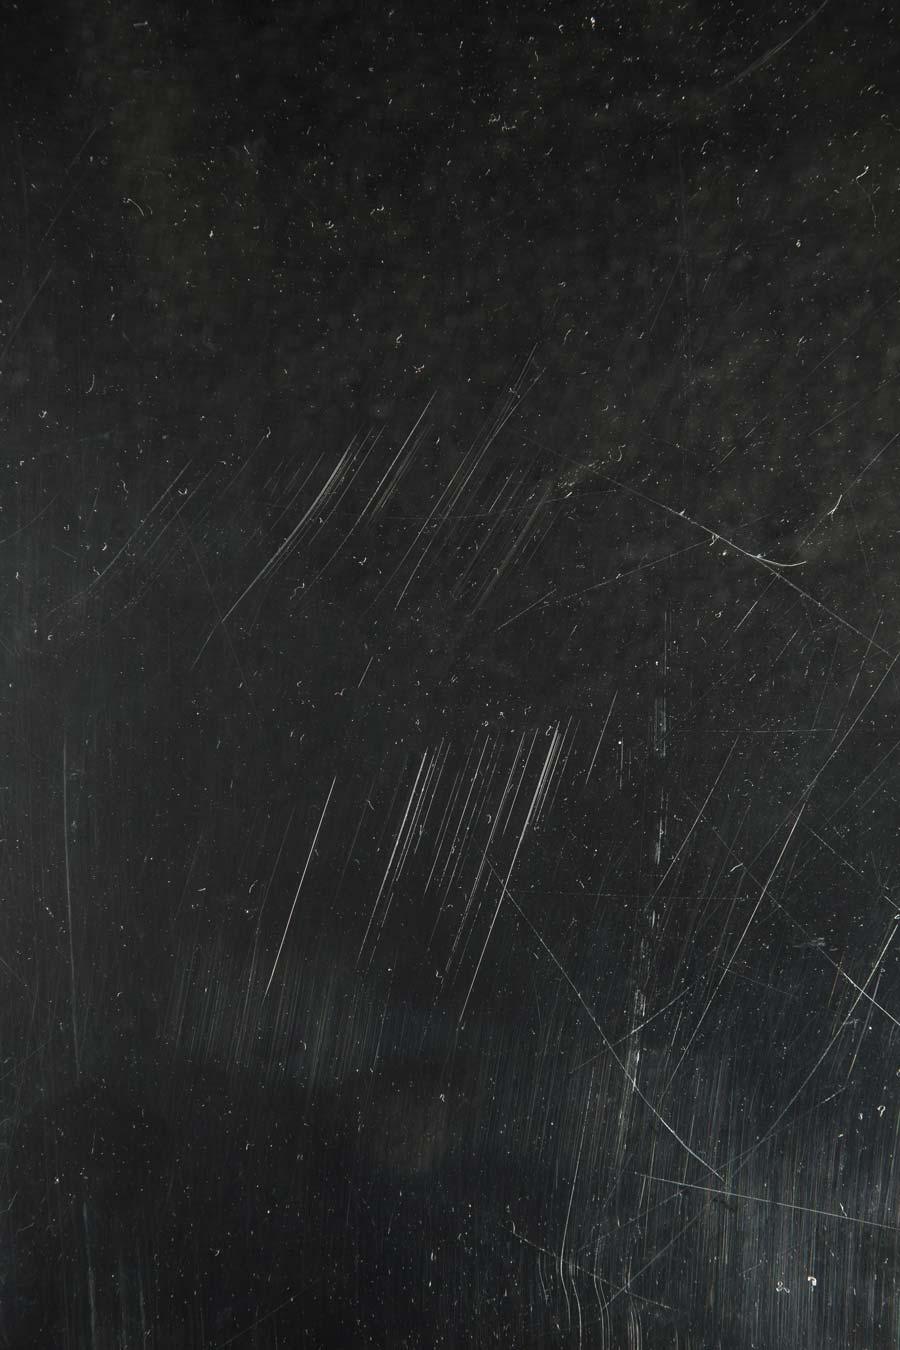 dust-scratch-effect-photoshop-overlay